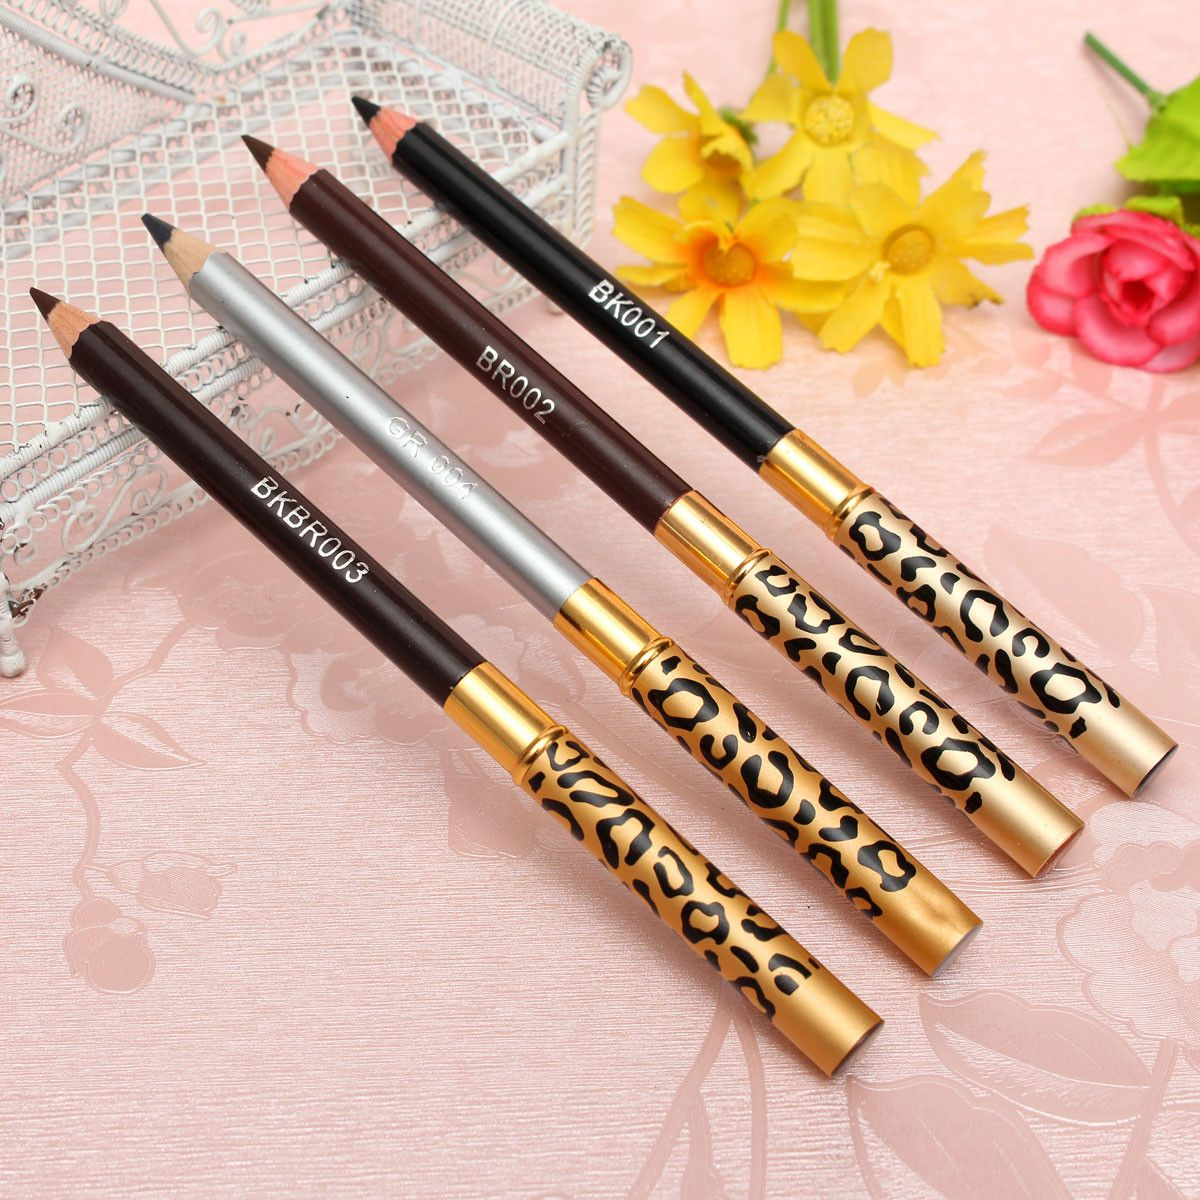 4 Colors 2 in 1 Makeup Eye Liner Eyebrow Pencil Pen Brush